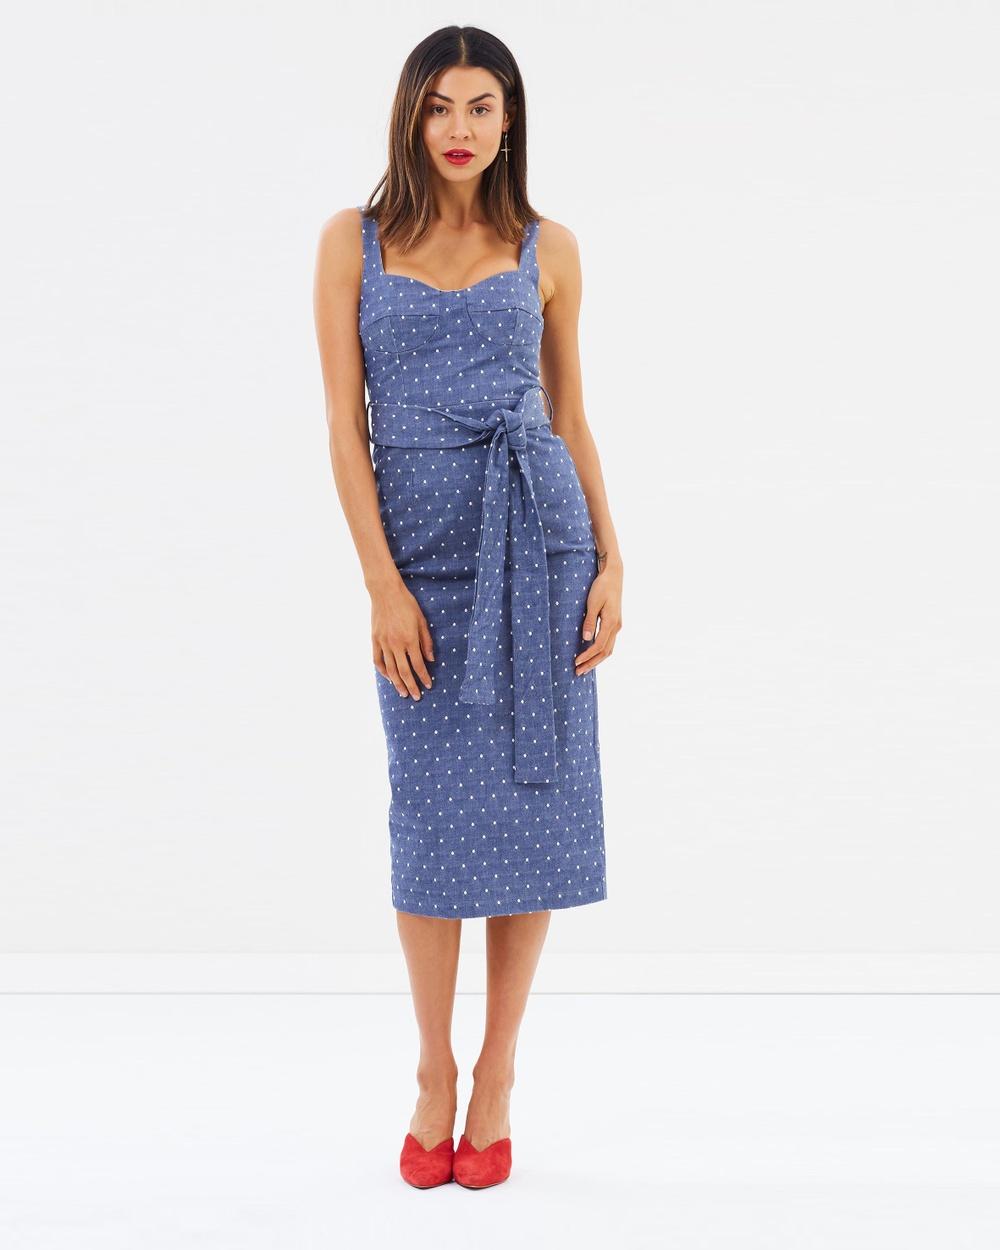 Pasduchas Getaway Brassiere Midi Dress Dresses Blue Getaway Brassiere Midi Dress